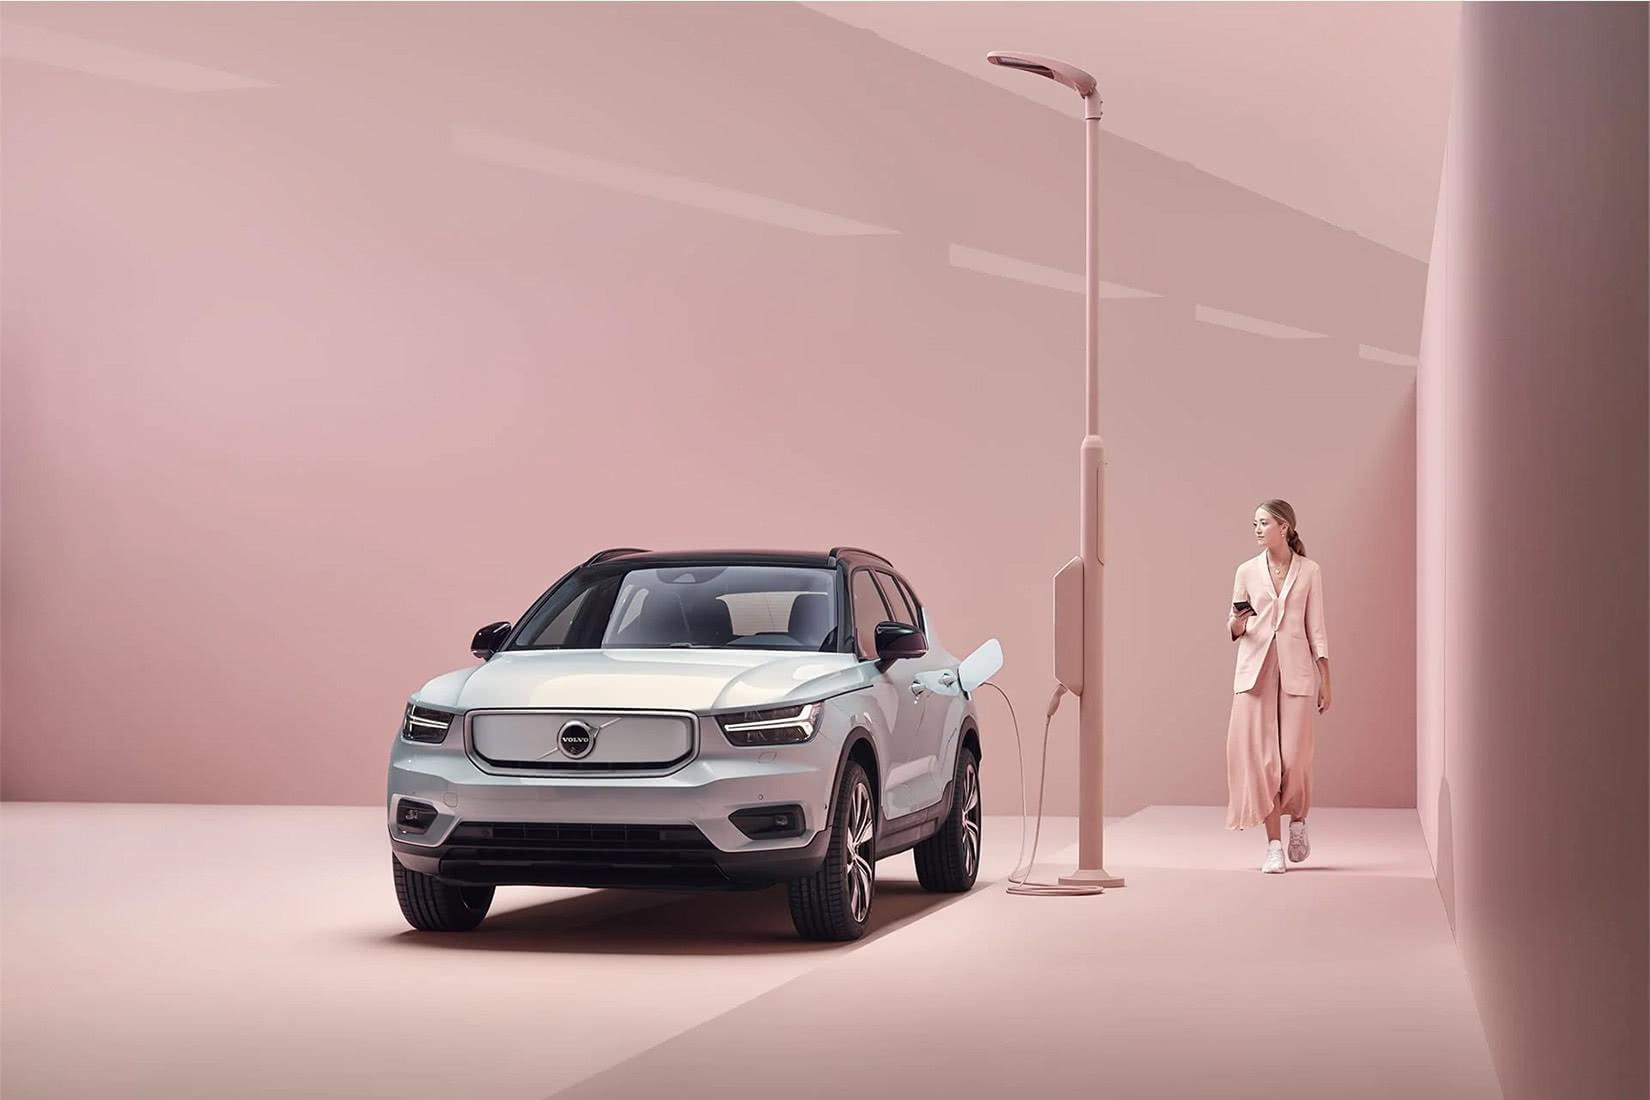 best luxury car brand volvo - Luxe Digital